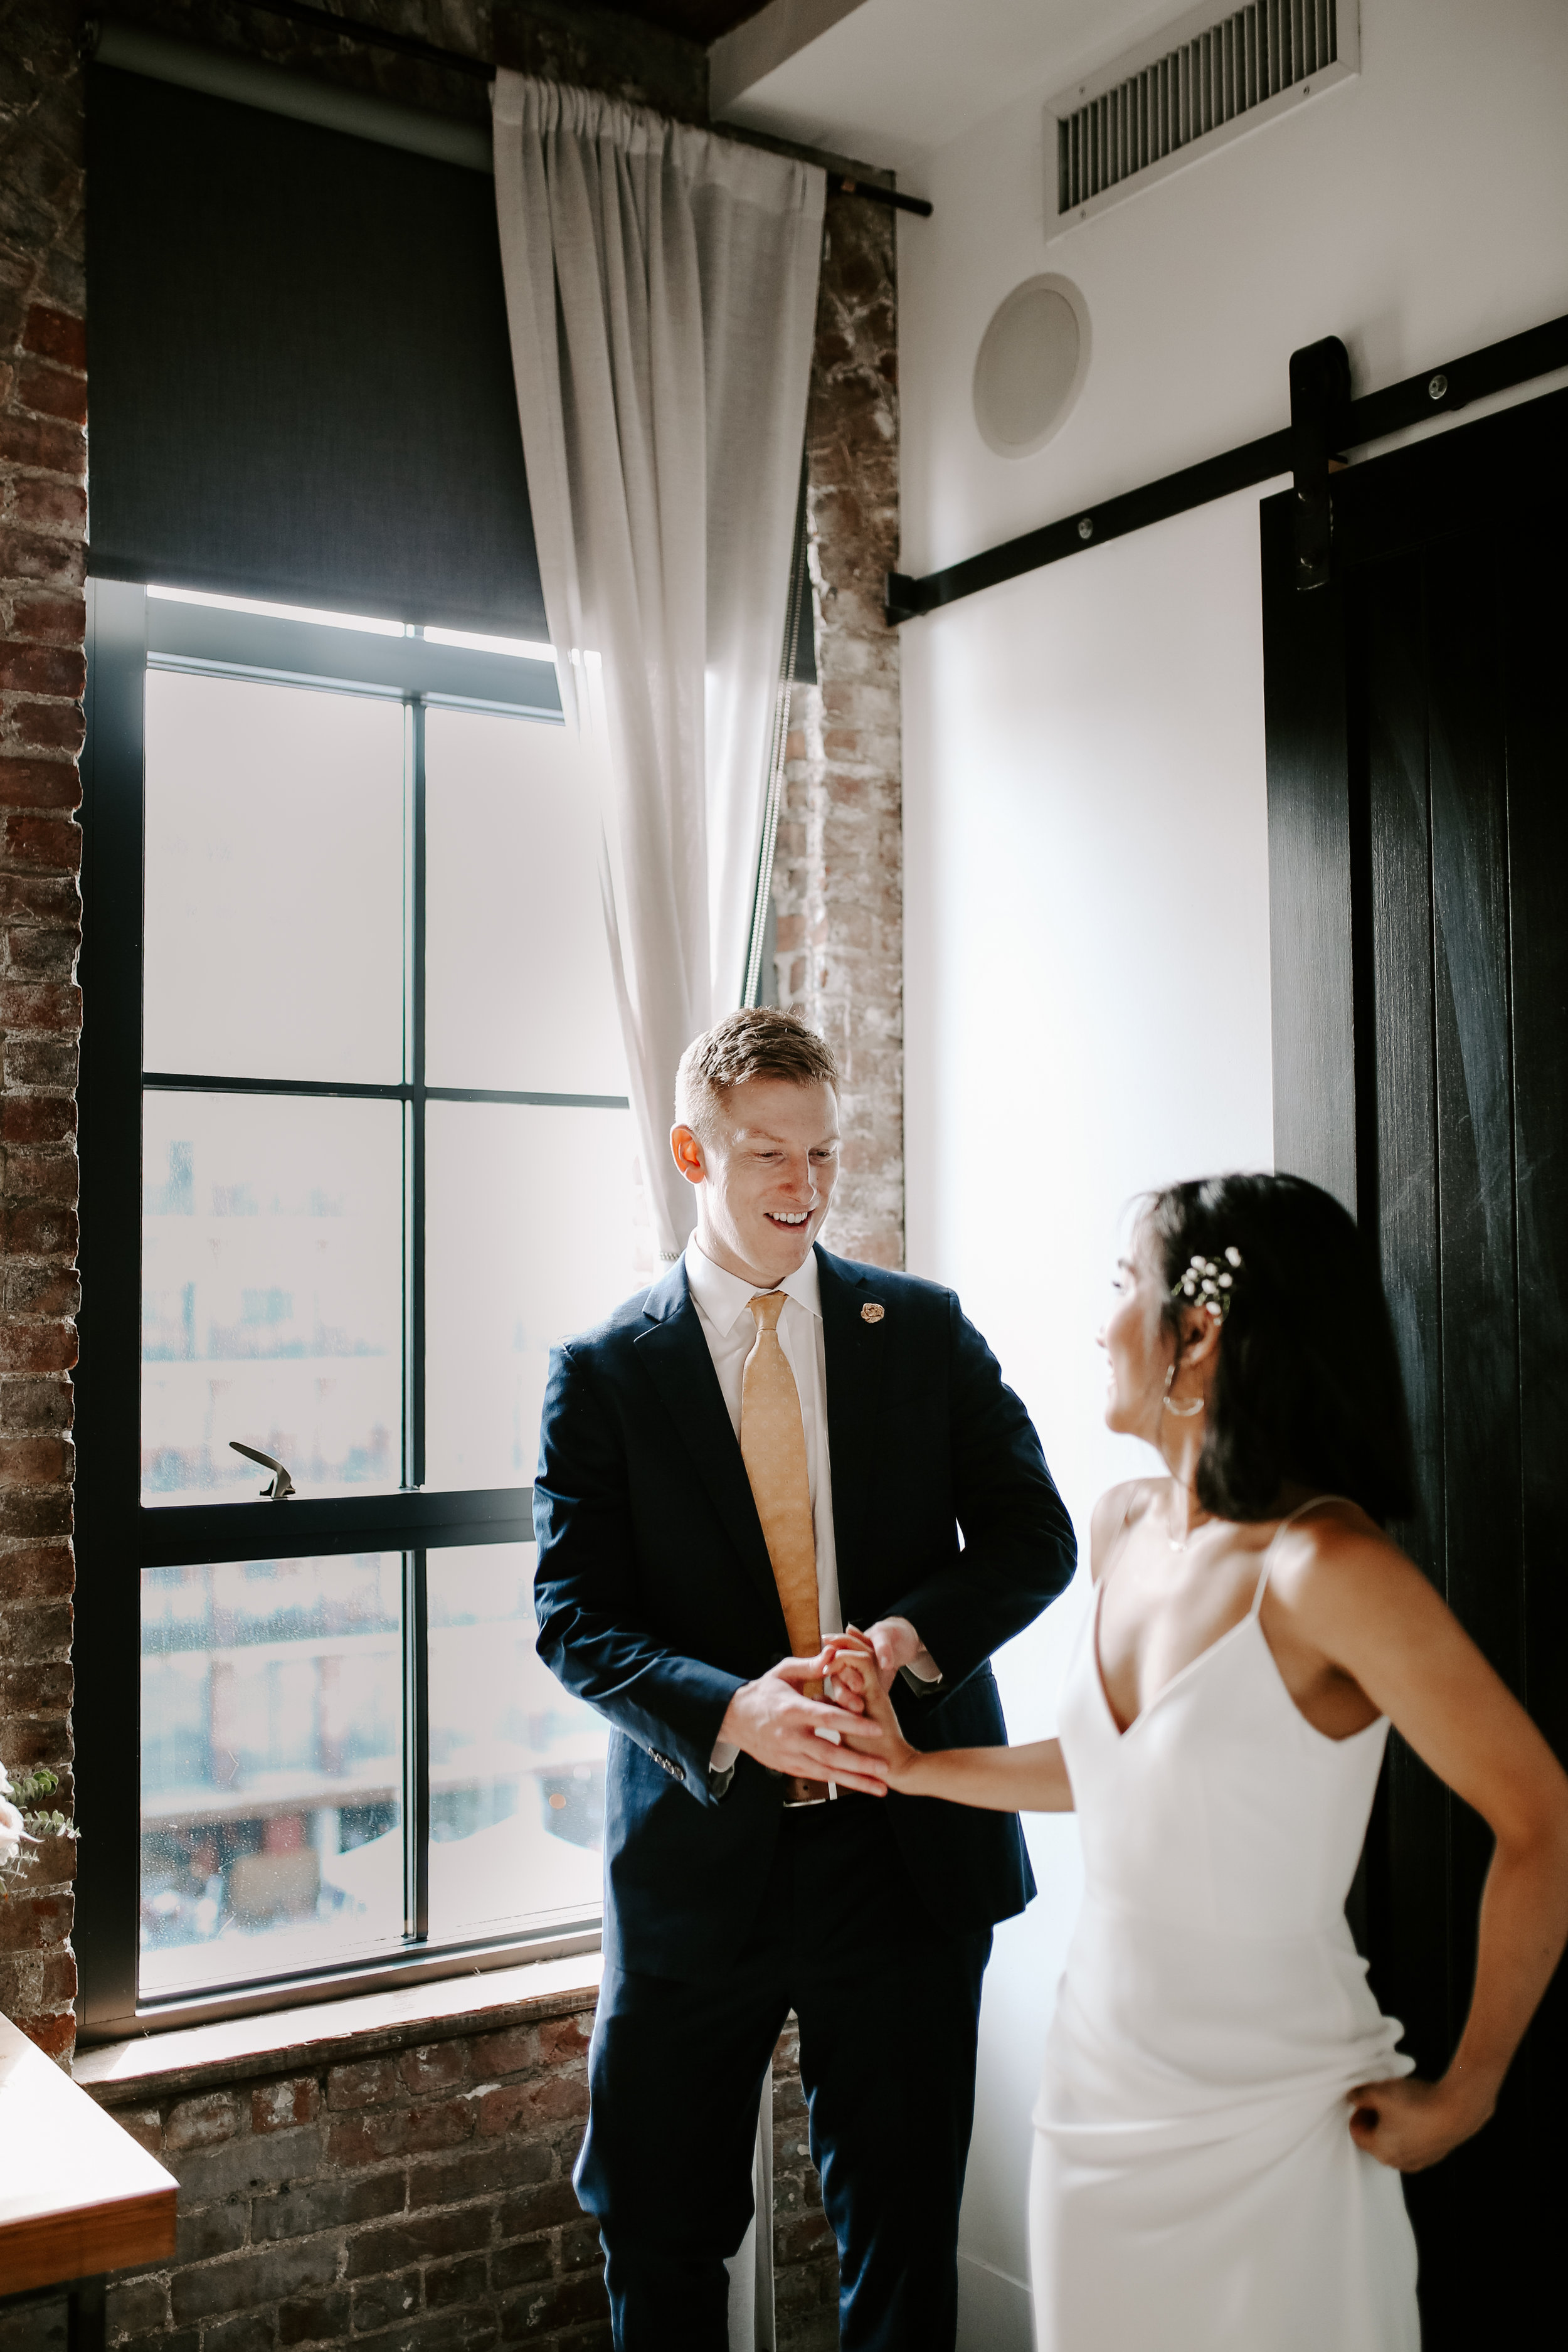 TheNichols_Married_2019-1-27.jpg